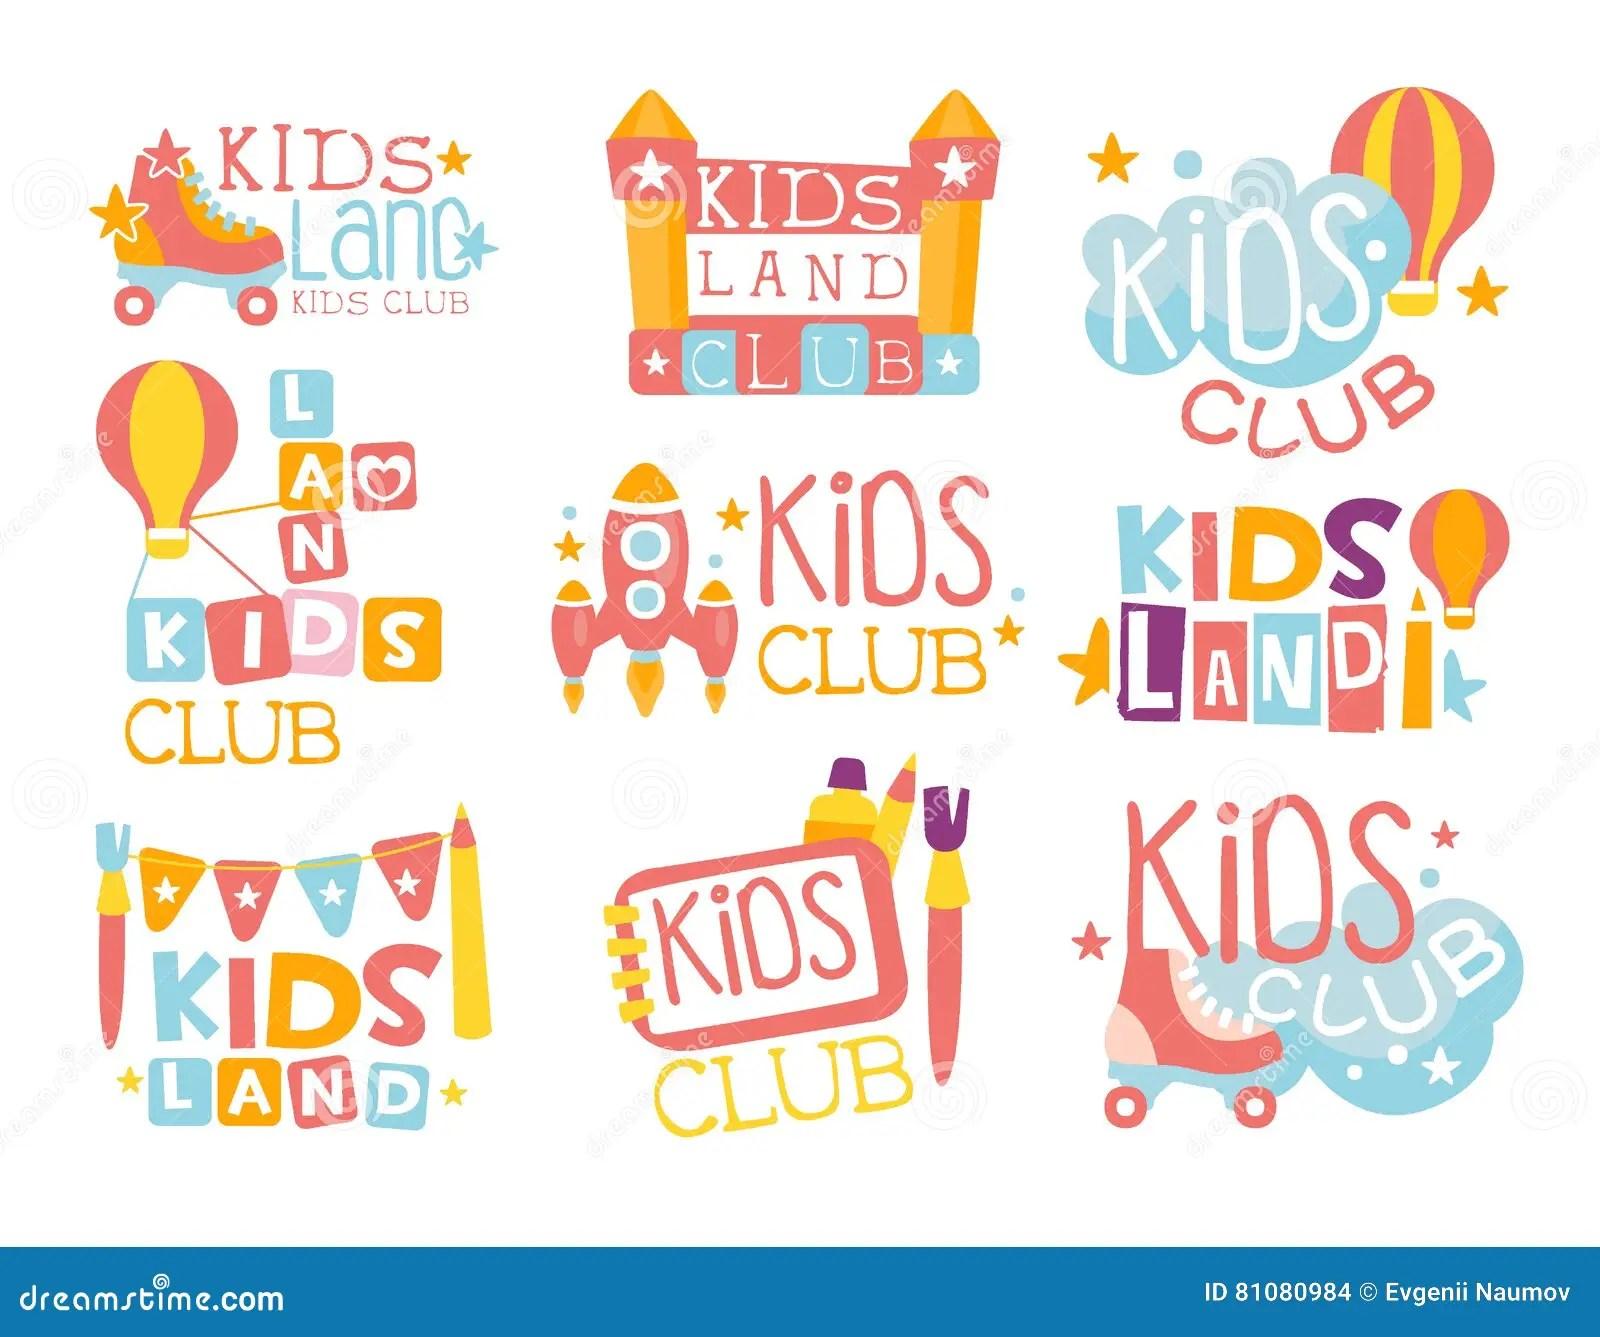 Kids Land Playground And Entertainment Club Set Of